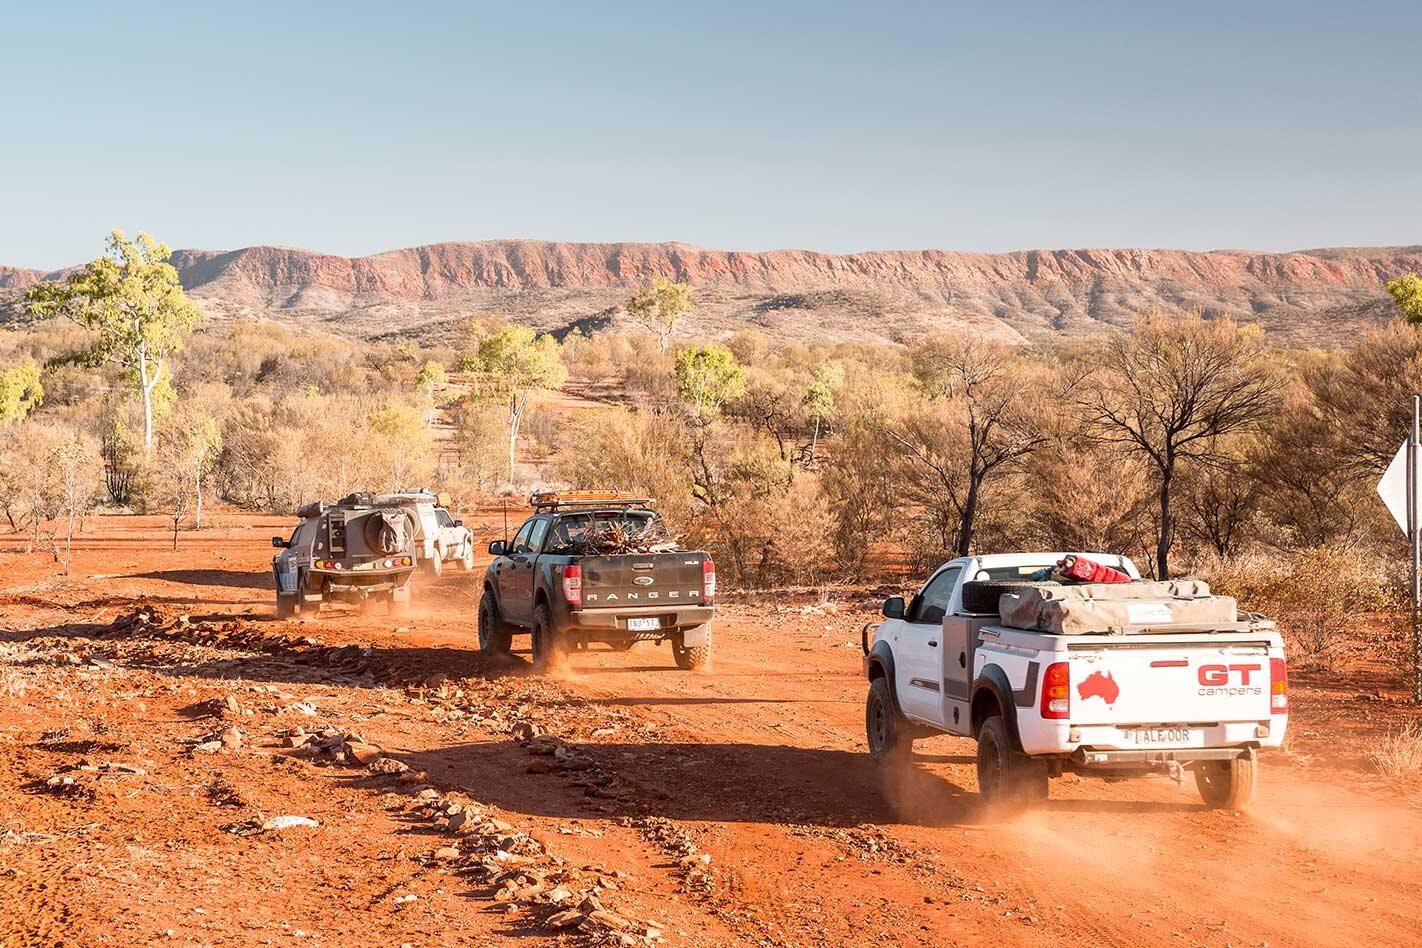 4x4 adventure through the centre of Australia Episode 1